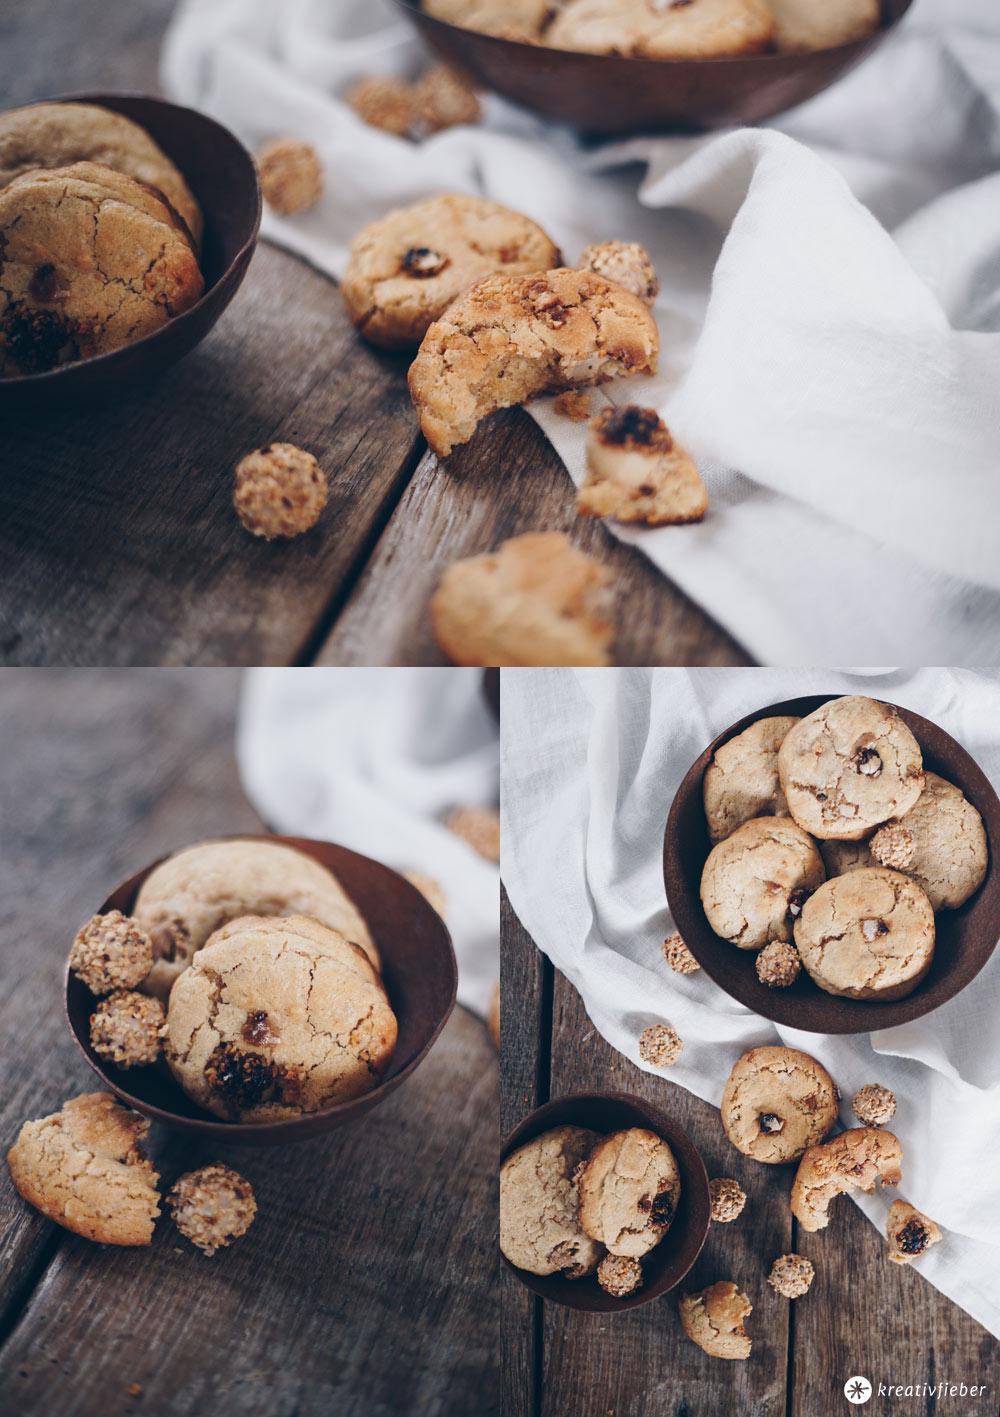 Giotto-Nuss-Kekse backen - Cookies Rezeptidee - außen knackig, innen chewy - Backideen mit Giotto